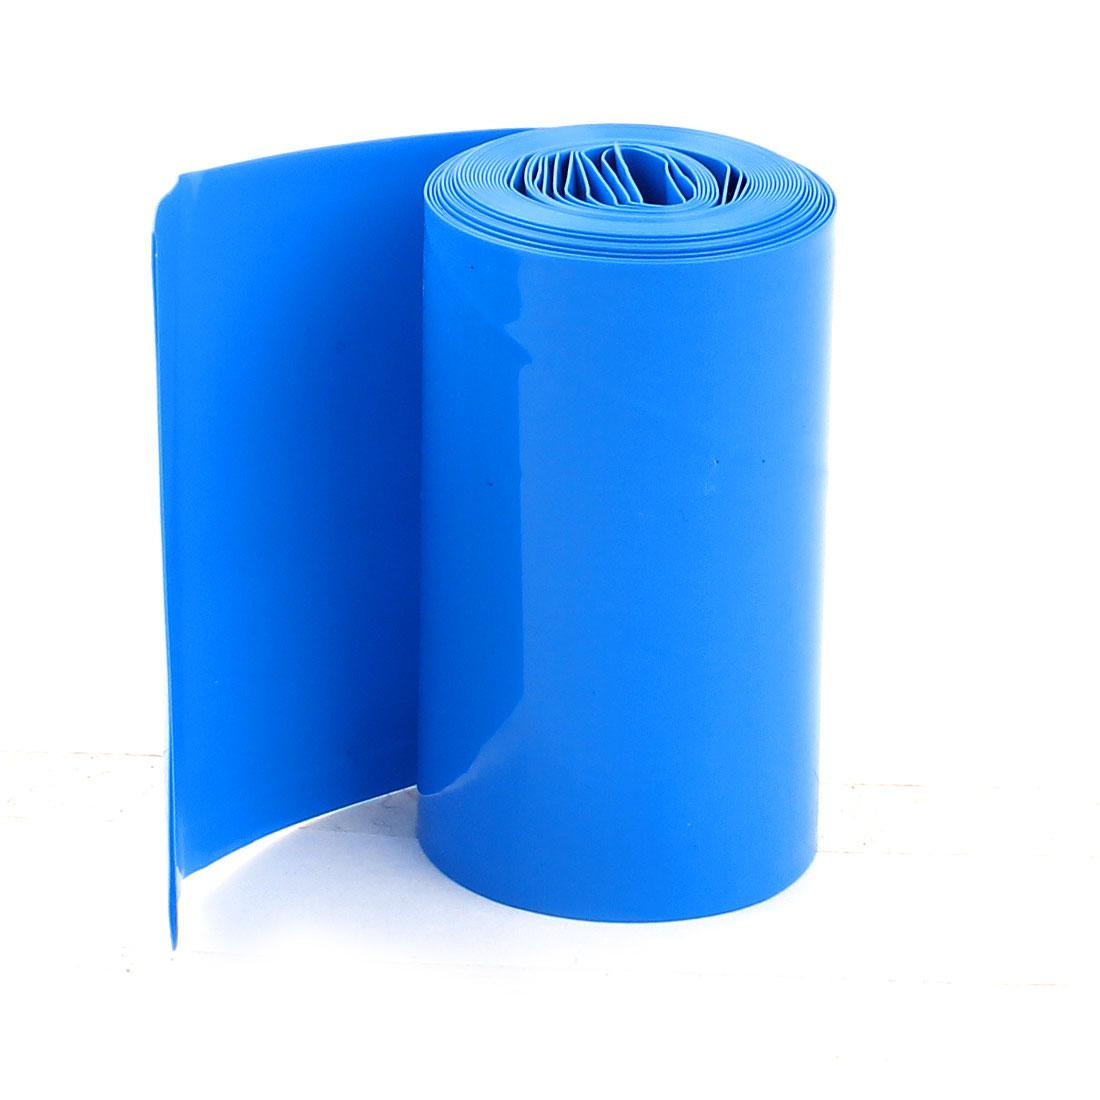 Uxcell 2Meters 50Mm   <font><b>85Mm</b></font> Width Pvc Heat <font><b>Shrink</b></font> Wrap <font><b>Tube</b></font> Blue For 2 X 18650 <font><b>Battery</b></font> .   black   blue   clear   green   grren  